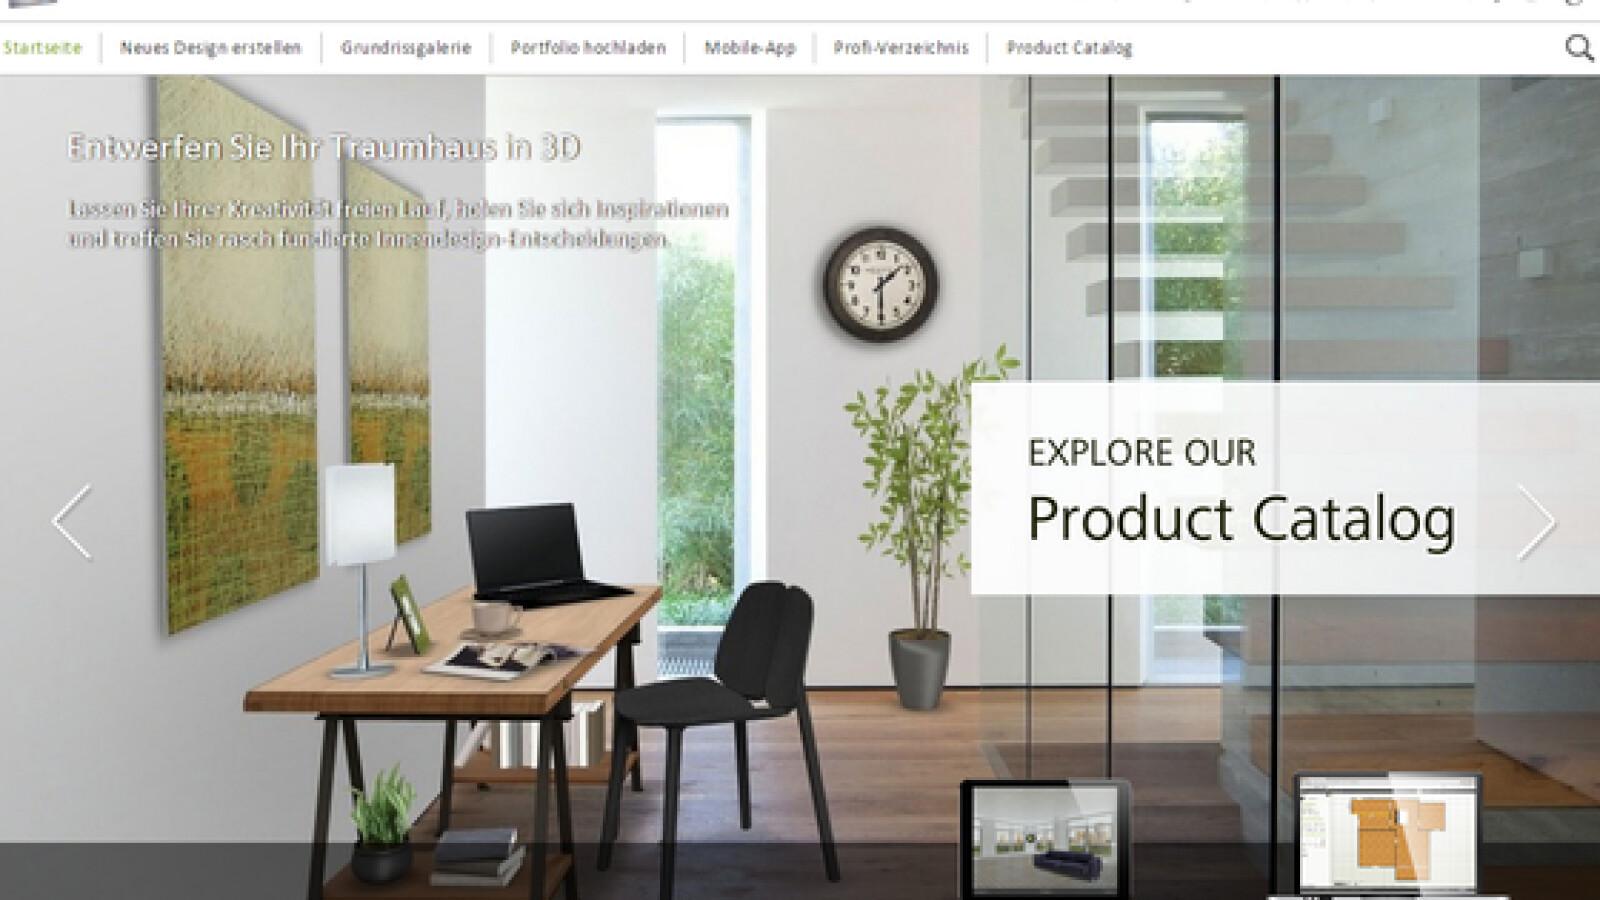 3d raumplaner app 3d raumplaner app with 3d raumplaner app fabulous fnf tools fr die im. Black Bedroom Furniture Sets. Home Design Ideas